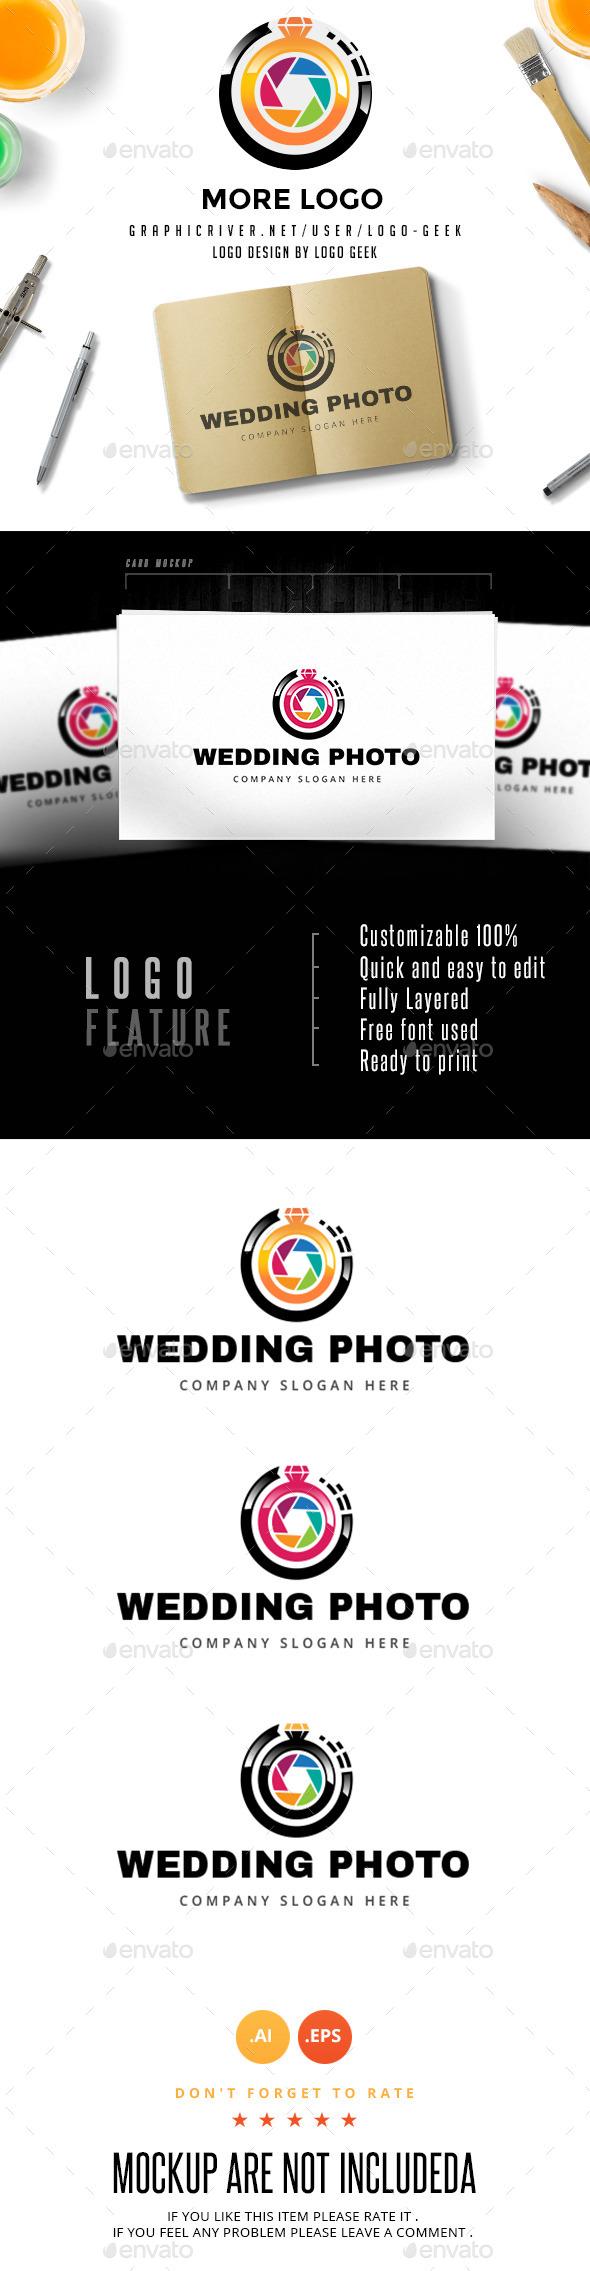 Wedding Photo Logo - Objects Logo Templates